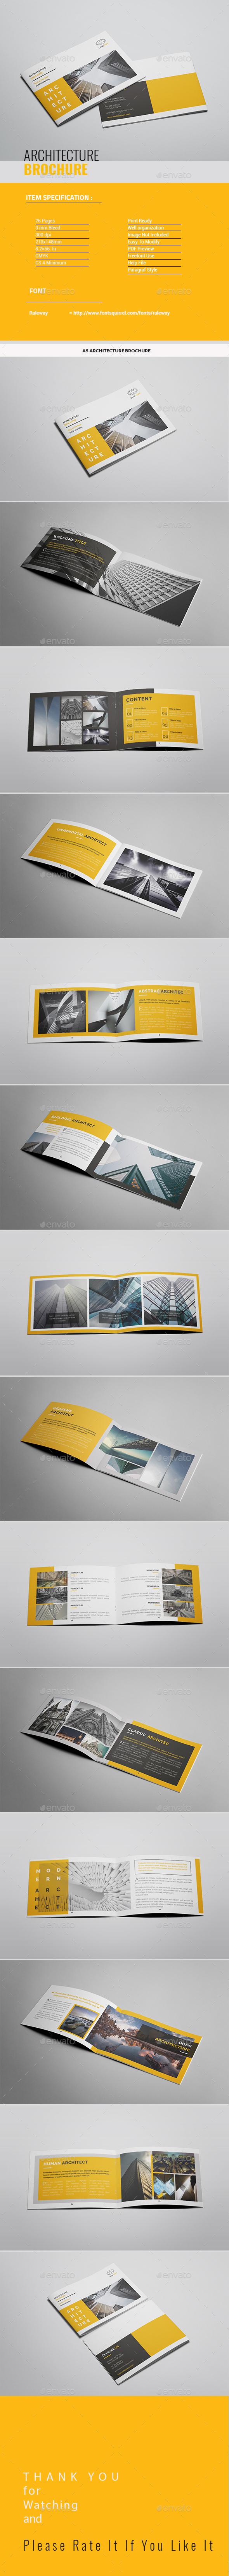 A5 Architecture Brochure - Portfolio Brochures